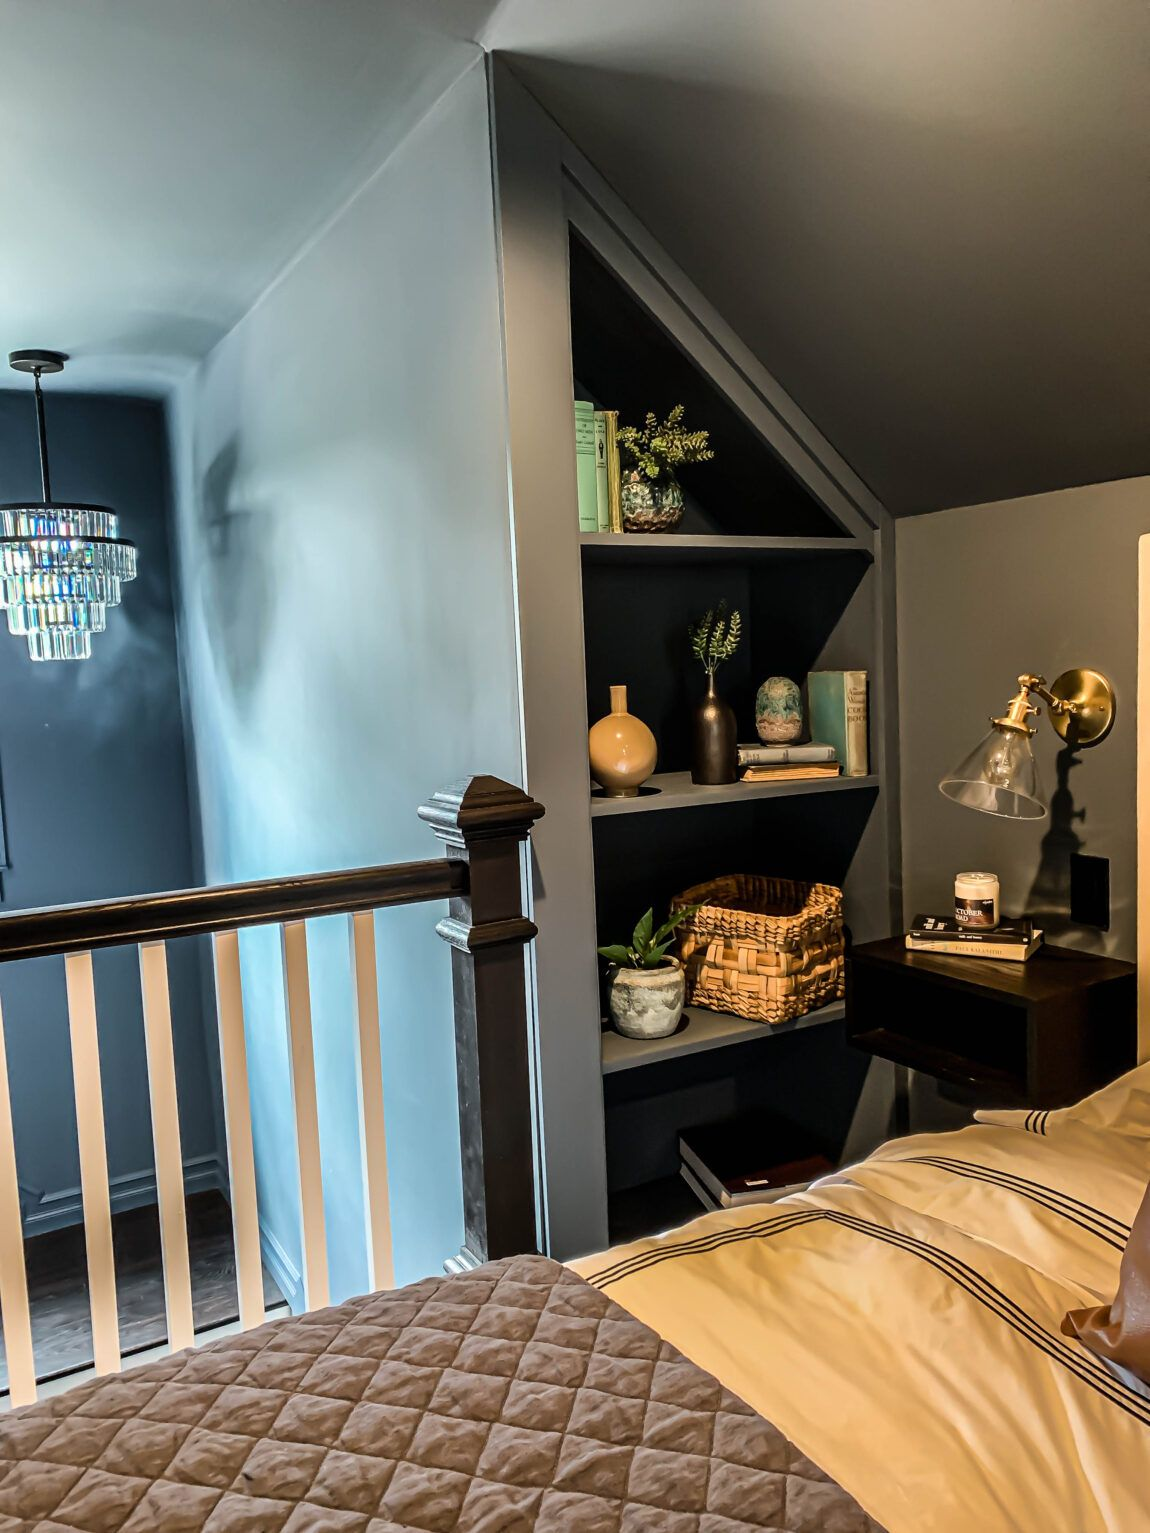 5 Keys To Creating A Dark Modern Moody Space Clark Aldine In 2020 Eclectic Bedroom Home Decor Bedroom Slanted Walls